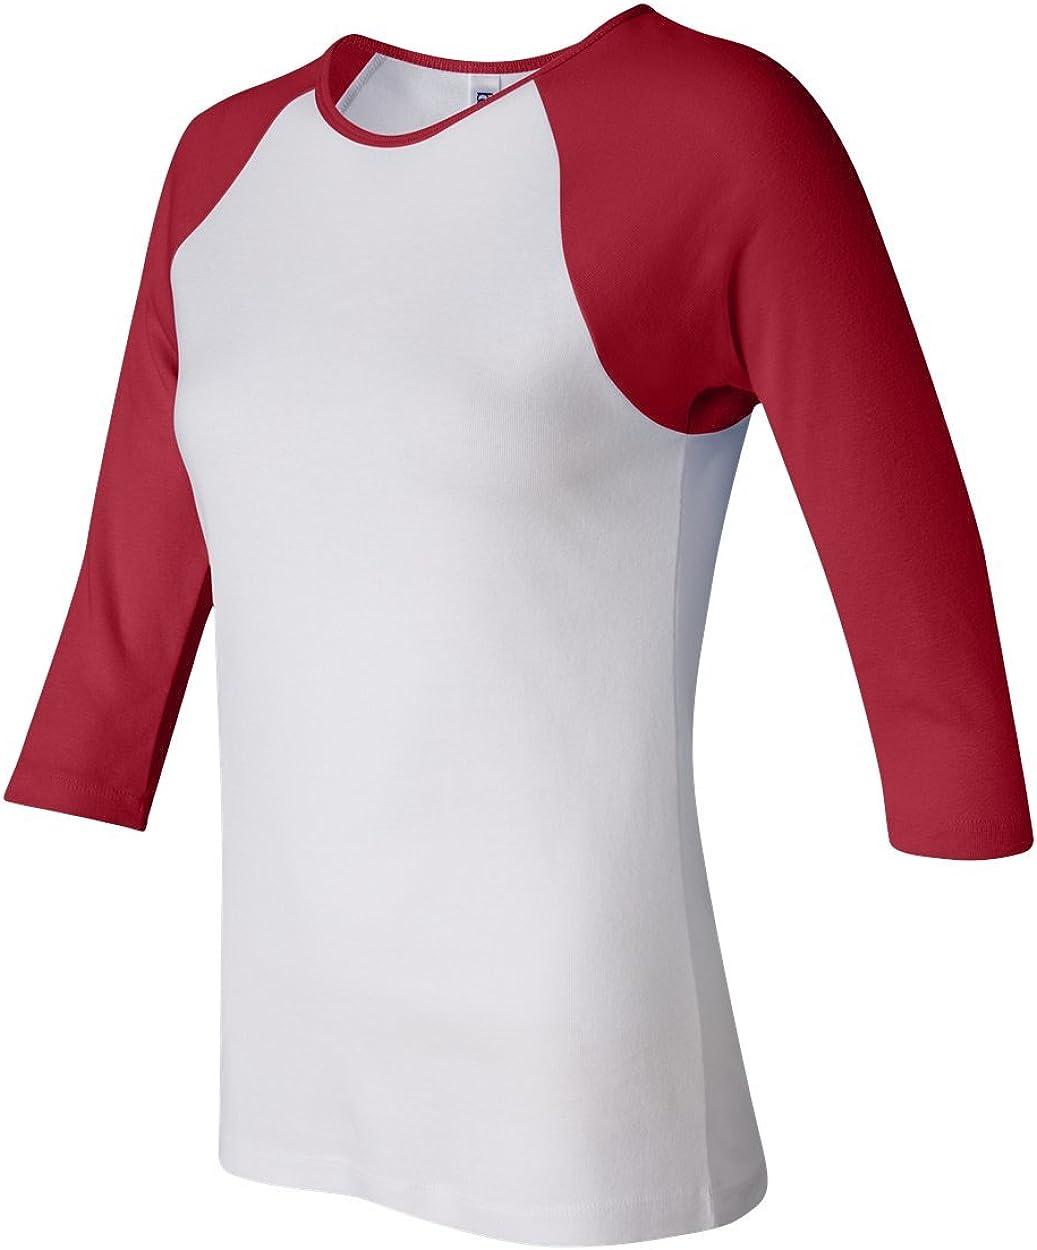 3M9G8Y/&0 Womens 3//4 Sleeve Tee Shirts Venezuela Flag Baseball Heart Raglan Baseball T-Shirts